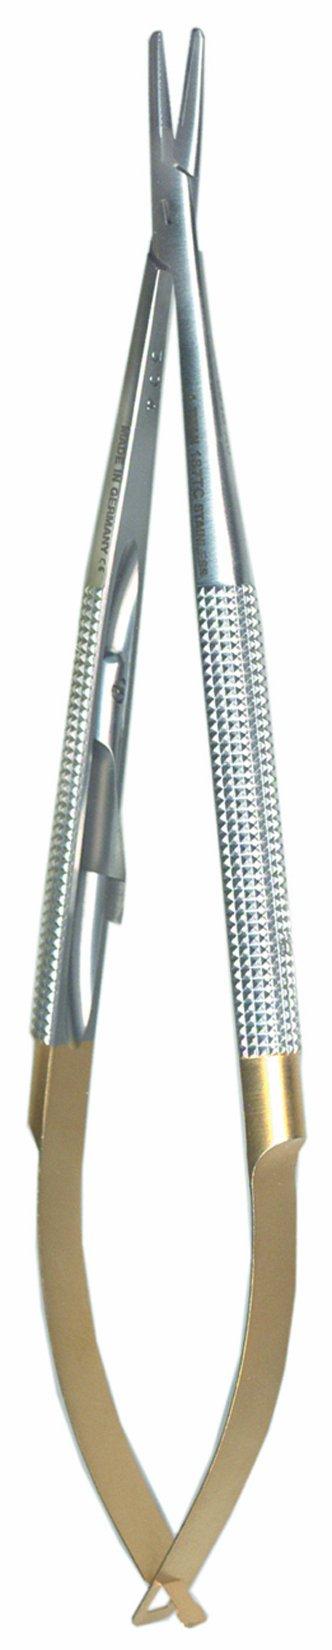 A. Titan 187TC Long Straight, Long Round Handle, Castro Viejo Needle Holder